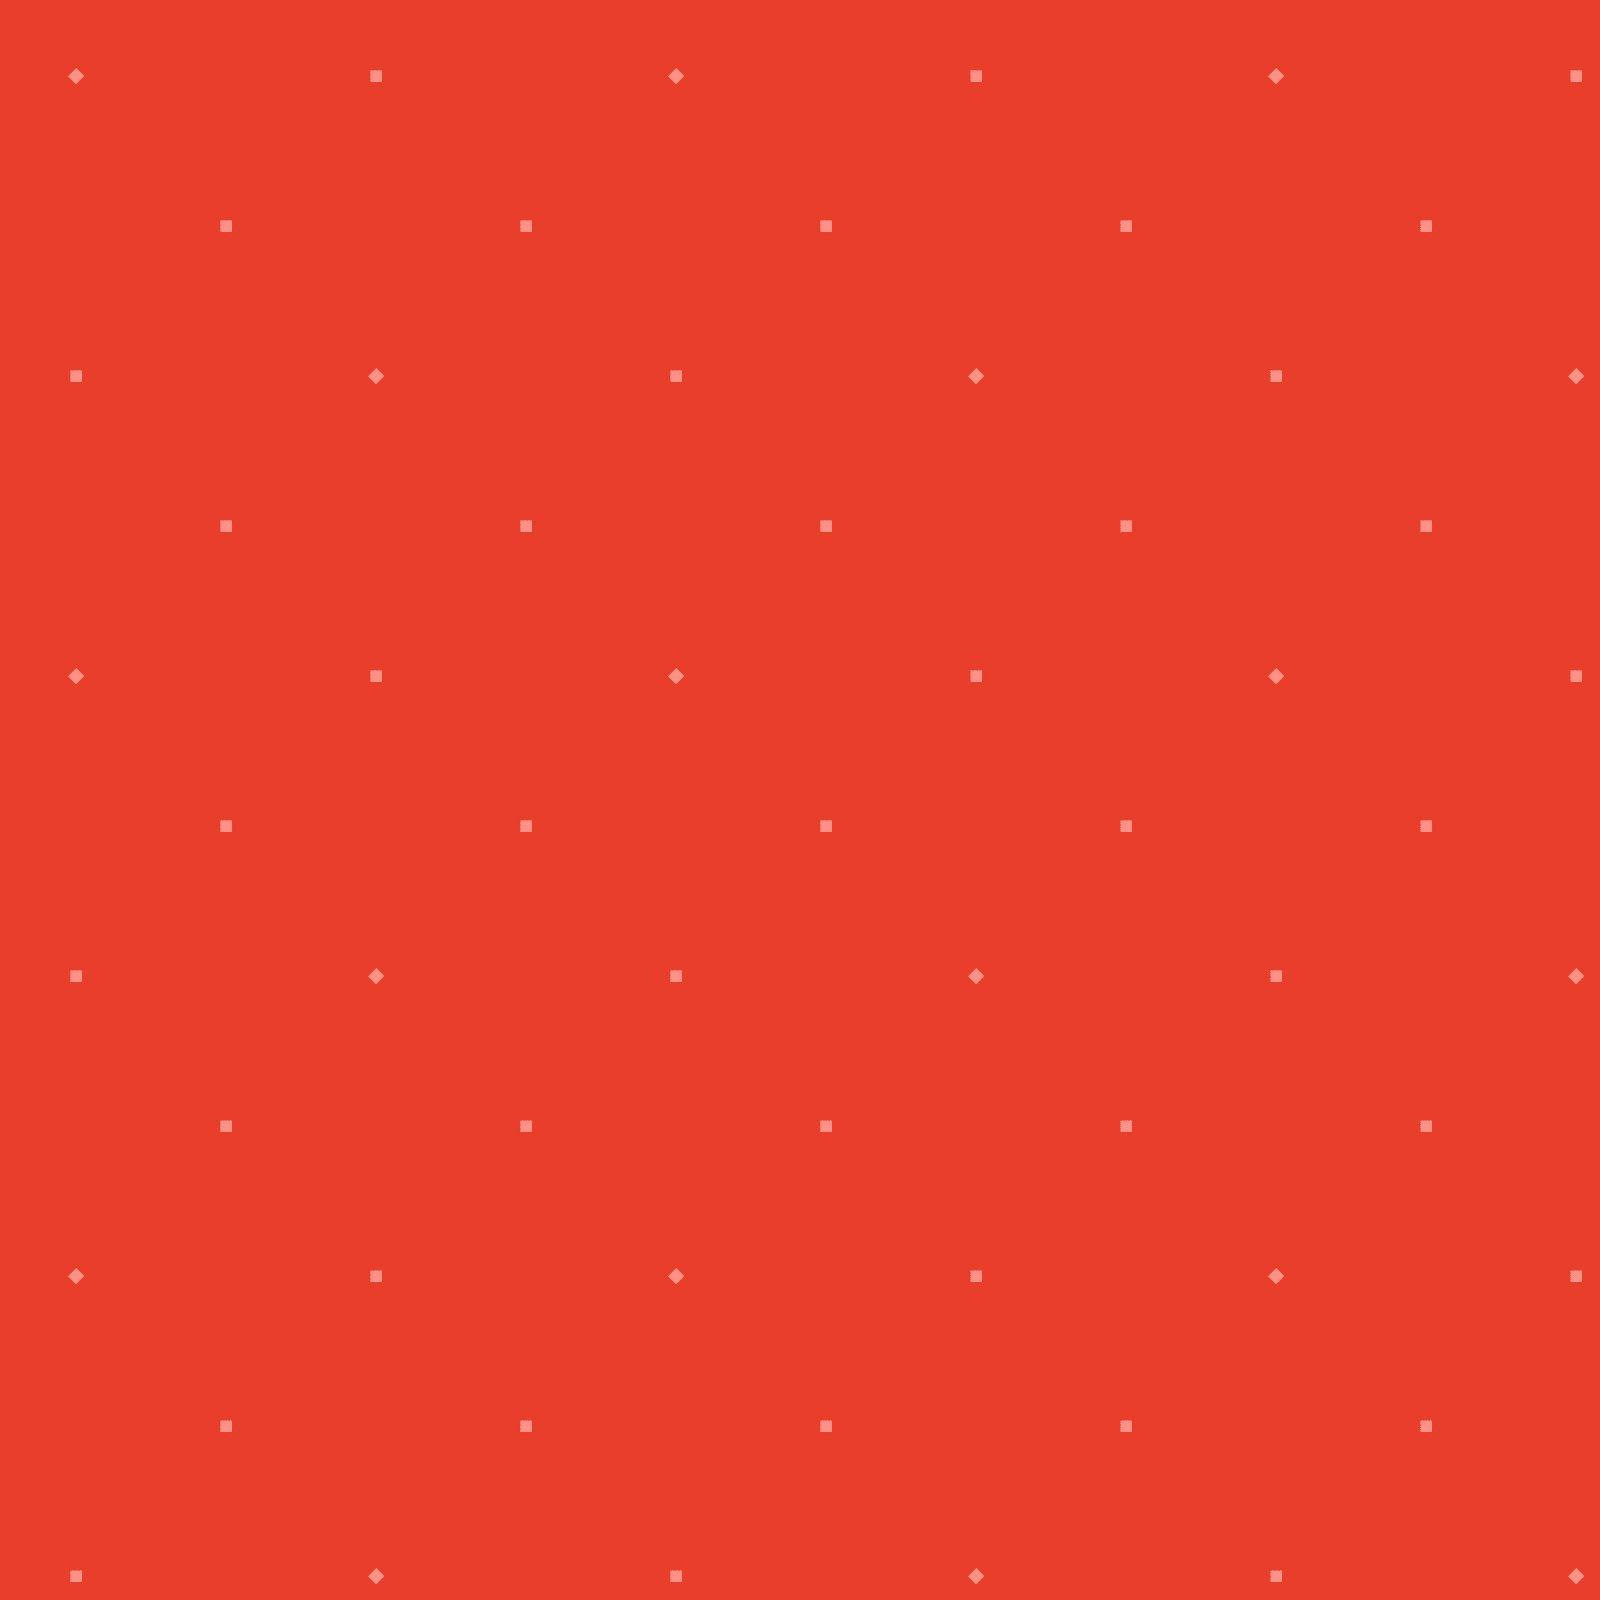 Square Up - Cherry Tomato